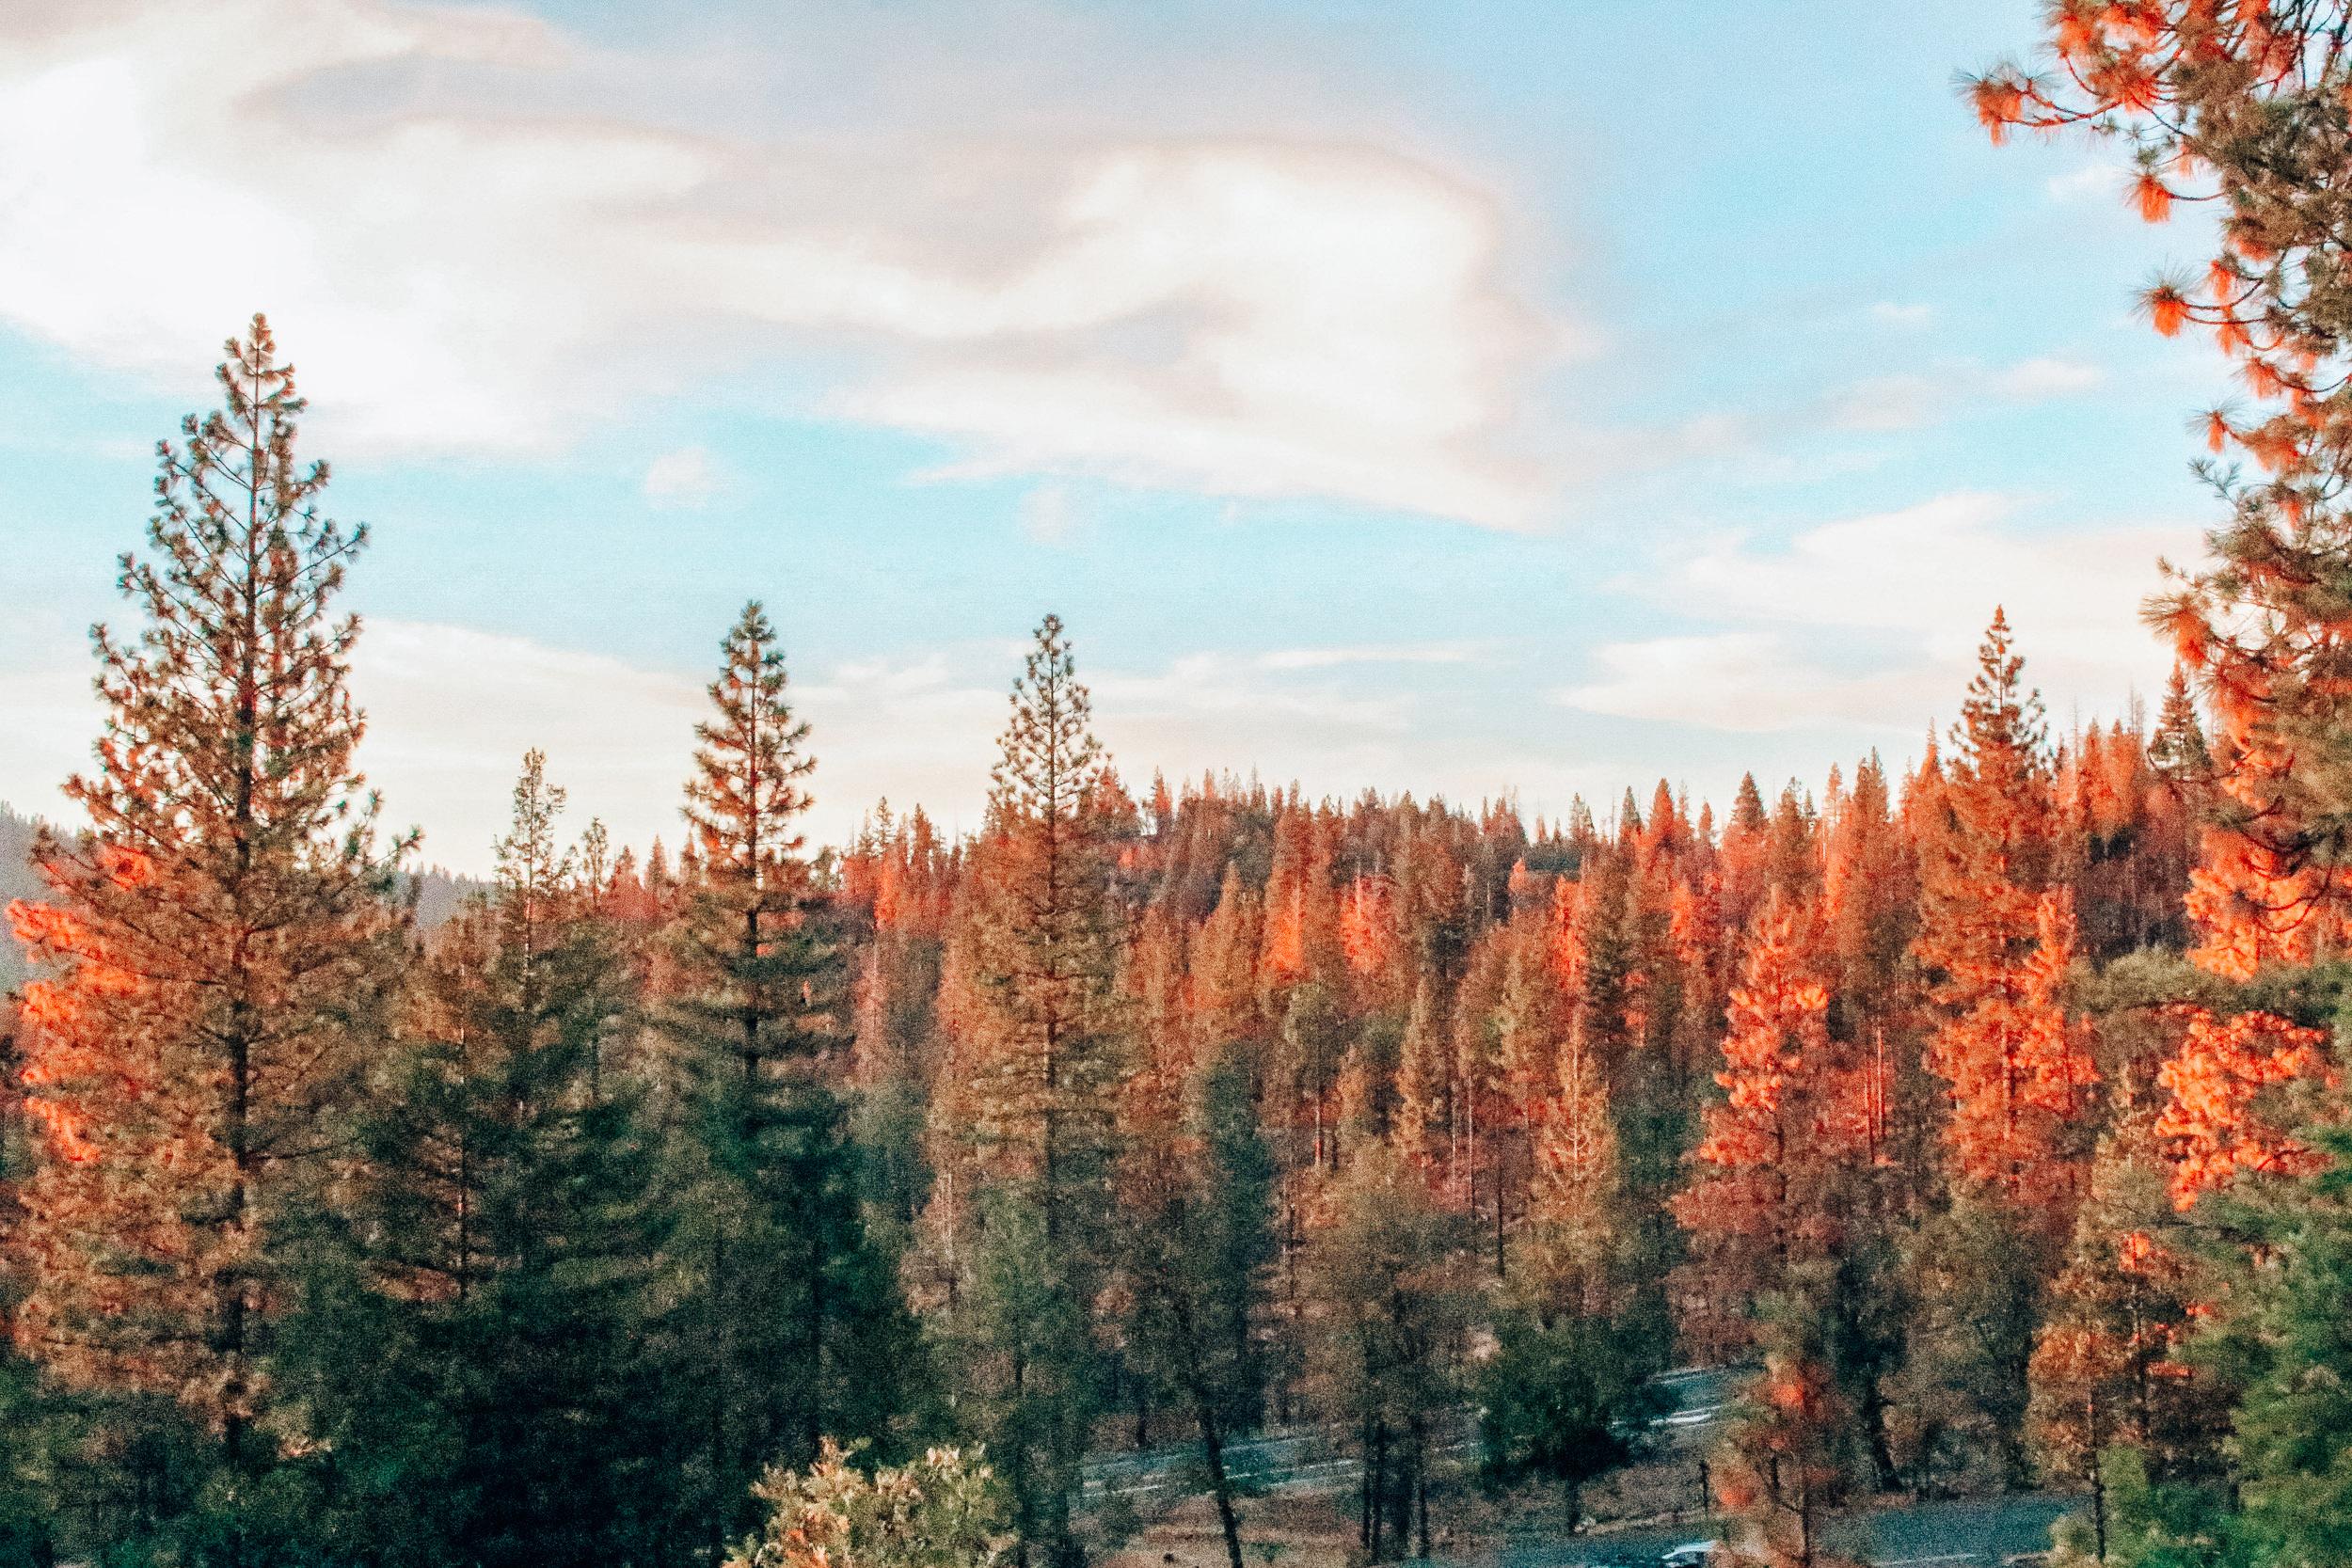 Yosemite National Park from Rush Creek Lodge